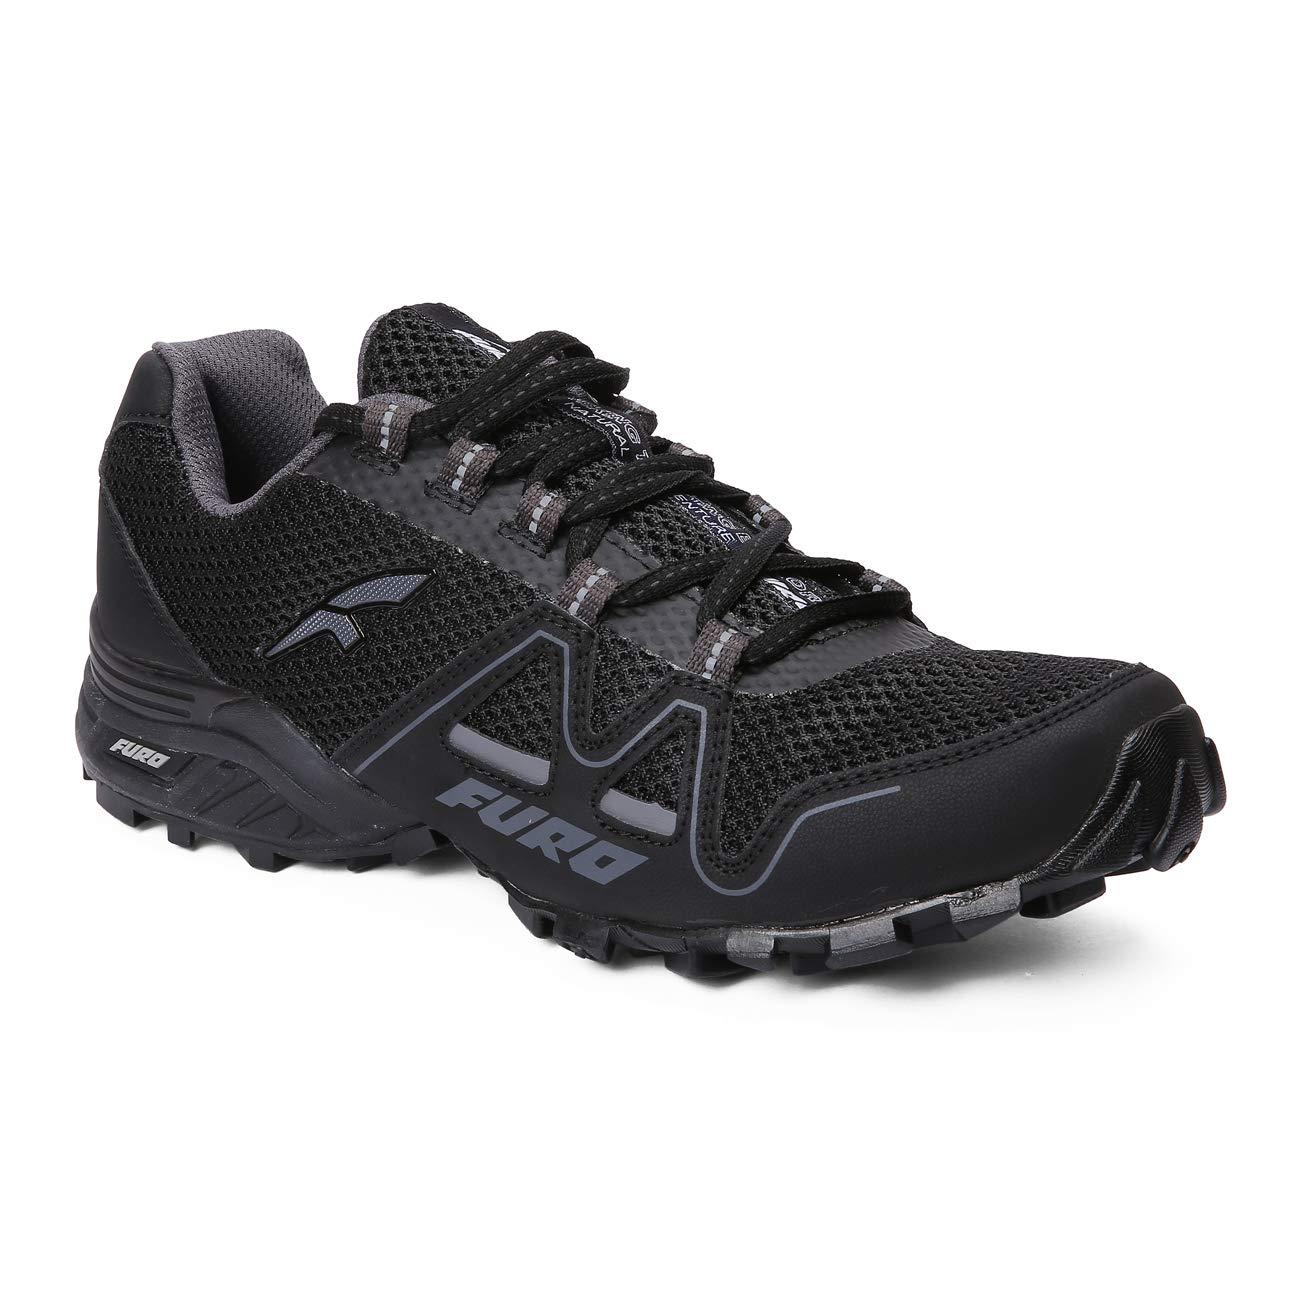 Buy FURO Men's Sports Shoes Online